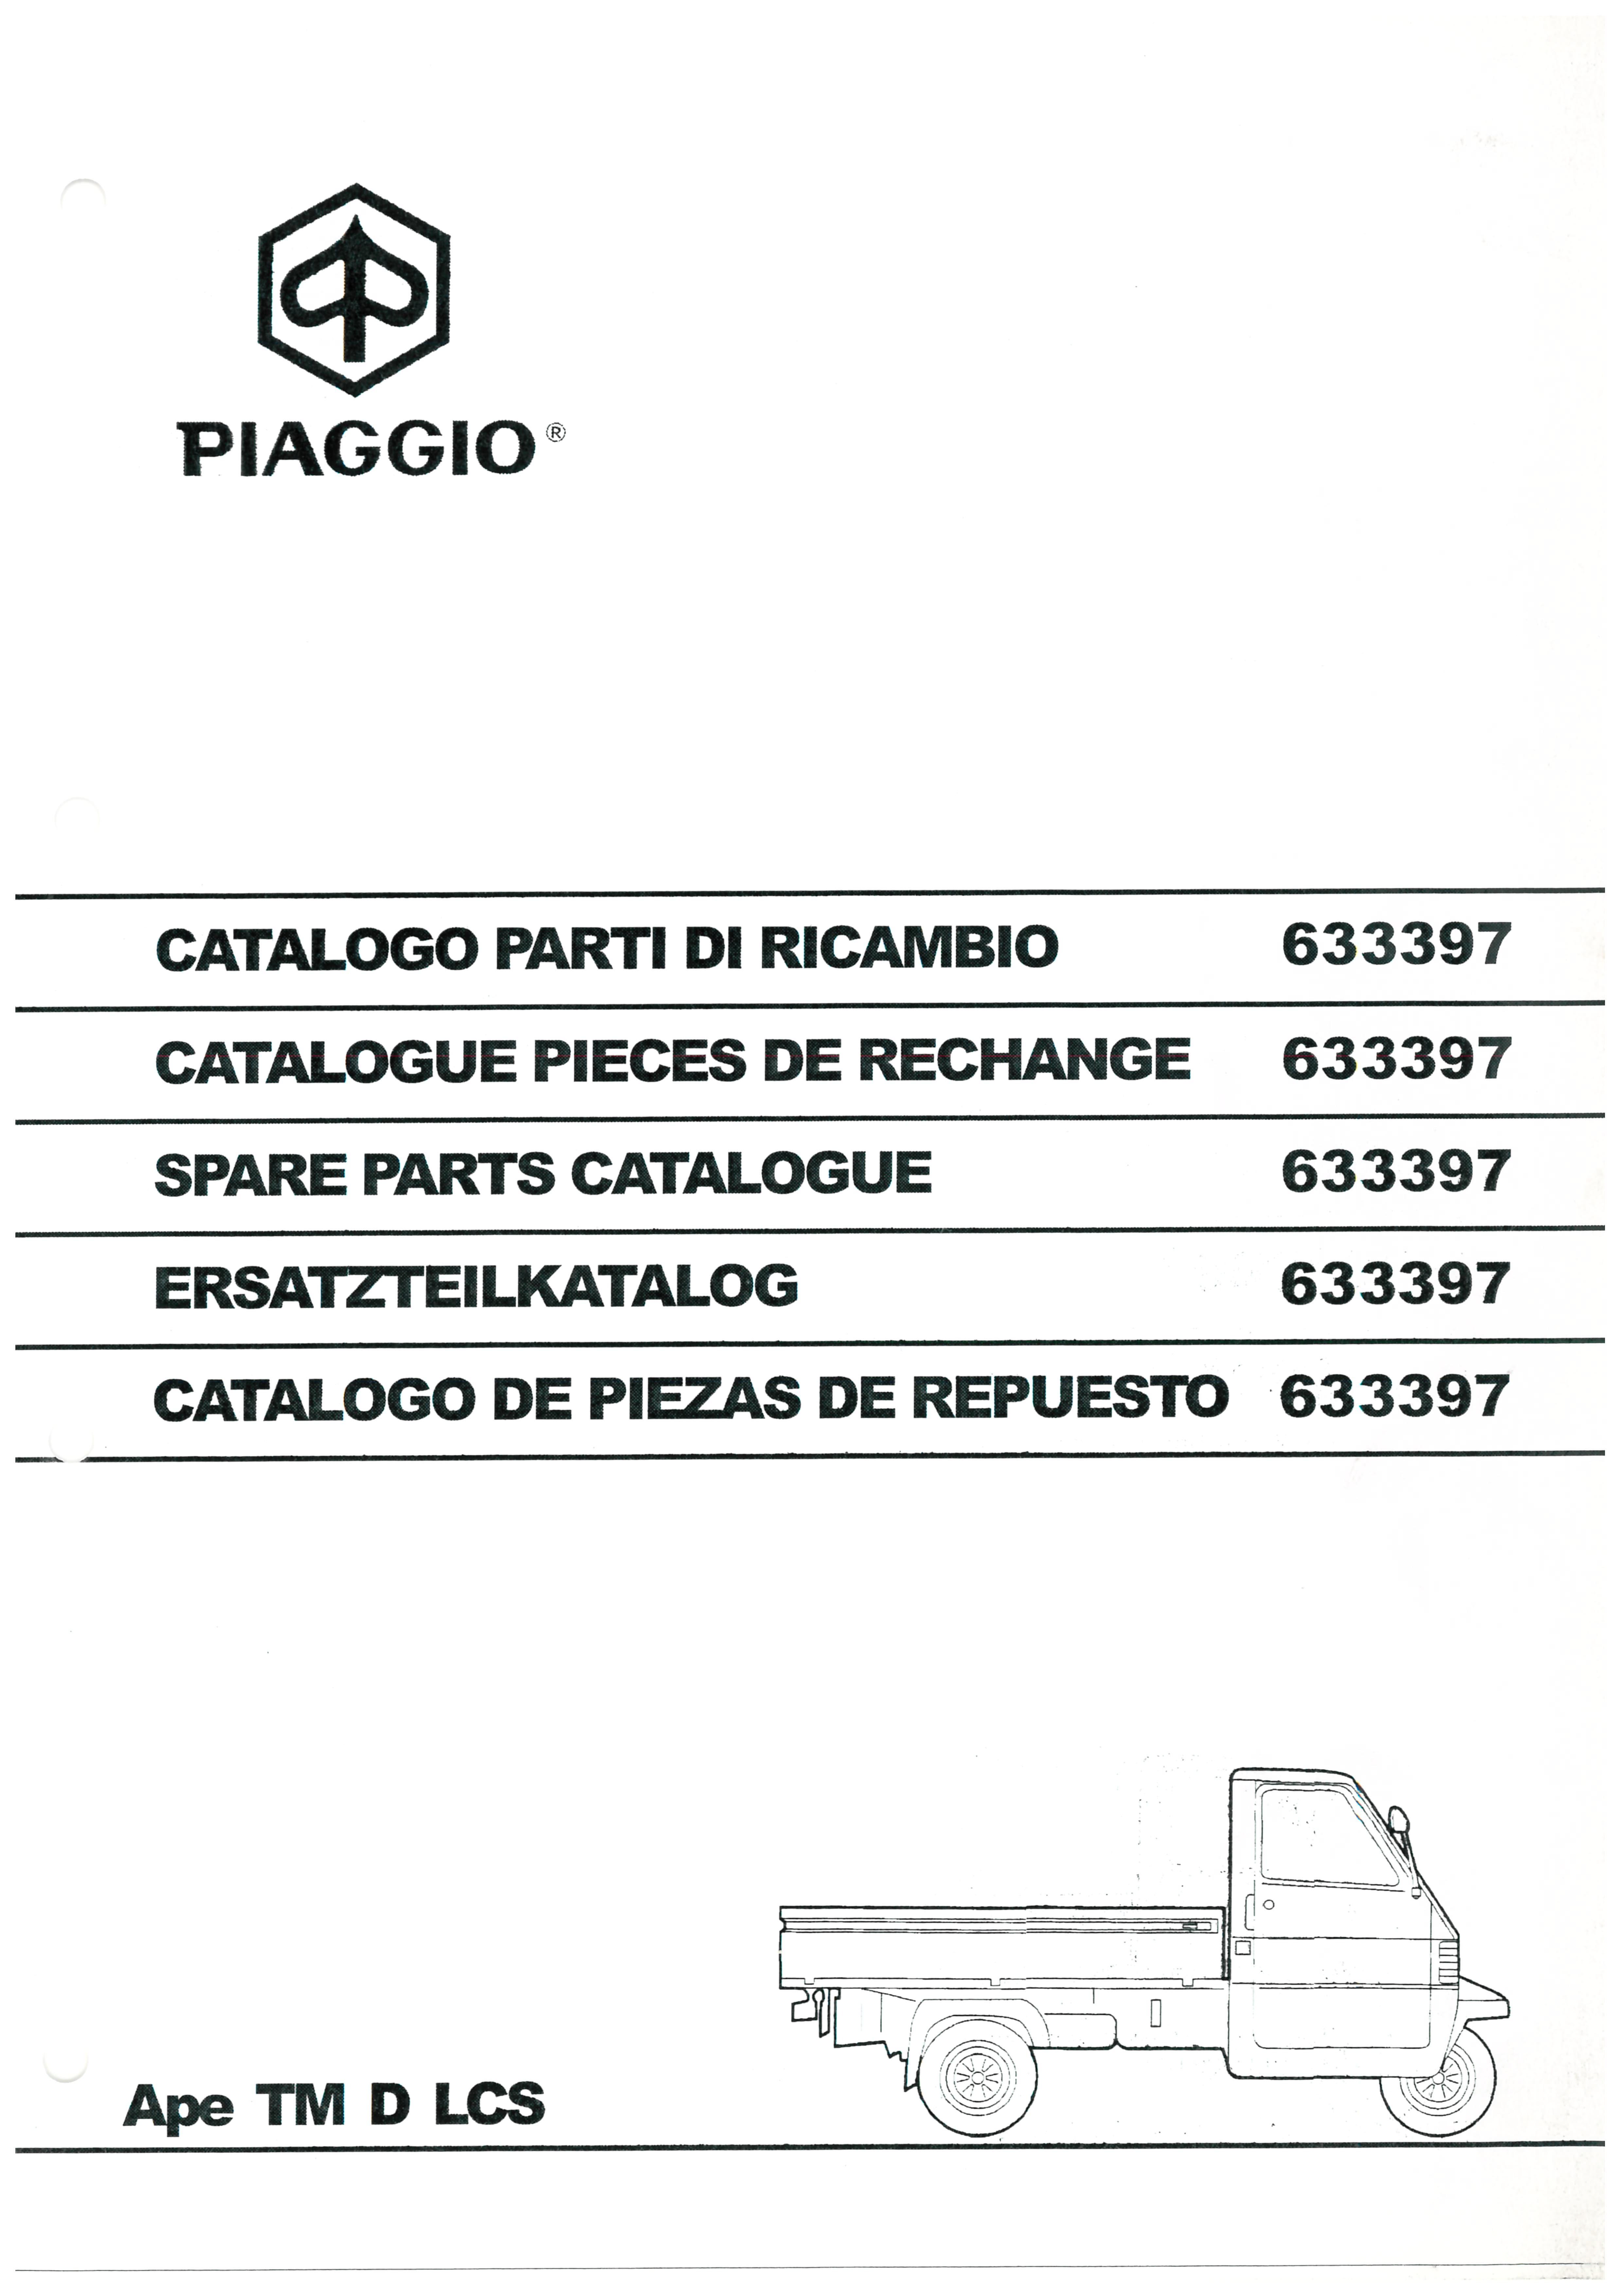 Catalogue Of Spare Parts Piaggio Ape Tm D Lcs Mod Zapt Vespadoc 50 Elestart Model V5a3t Wiring Diagram All About Diagrams